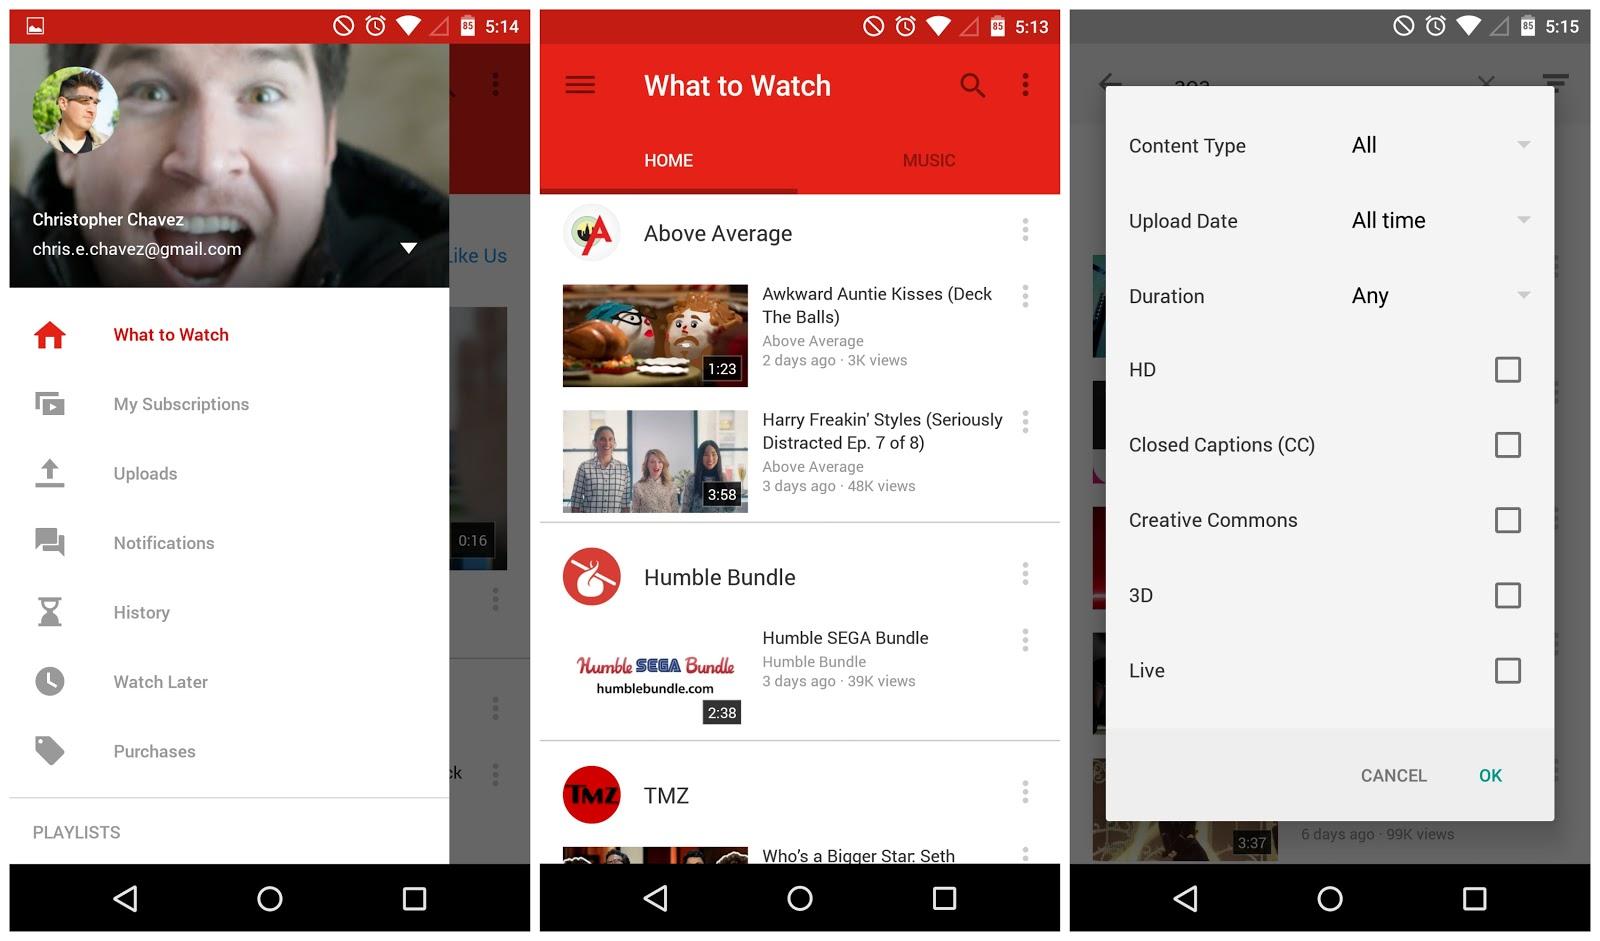 تحديث لتطبيق اليوتيوب YouTube v10.12.53 YouTube-6.0.11-Mater